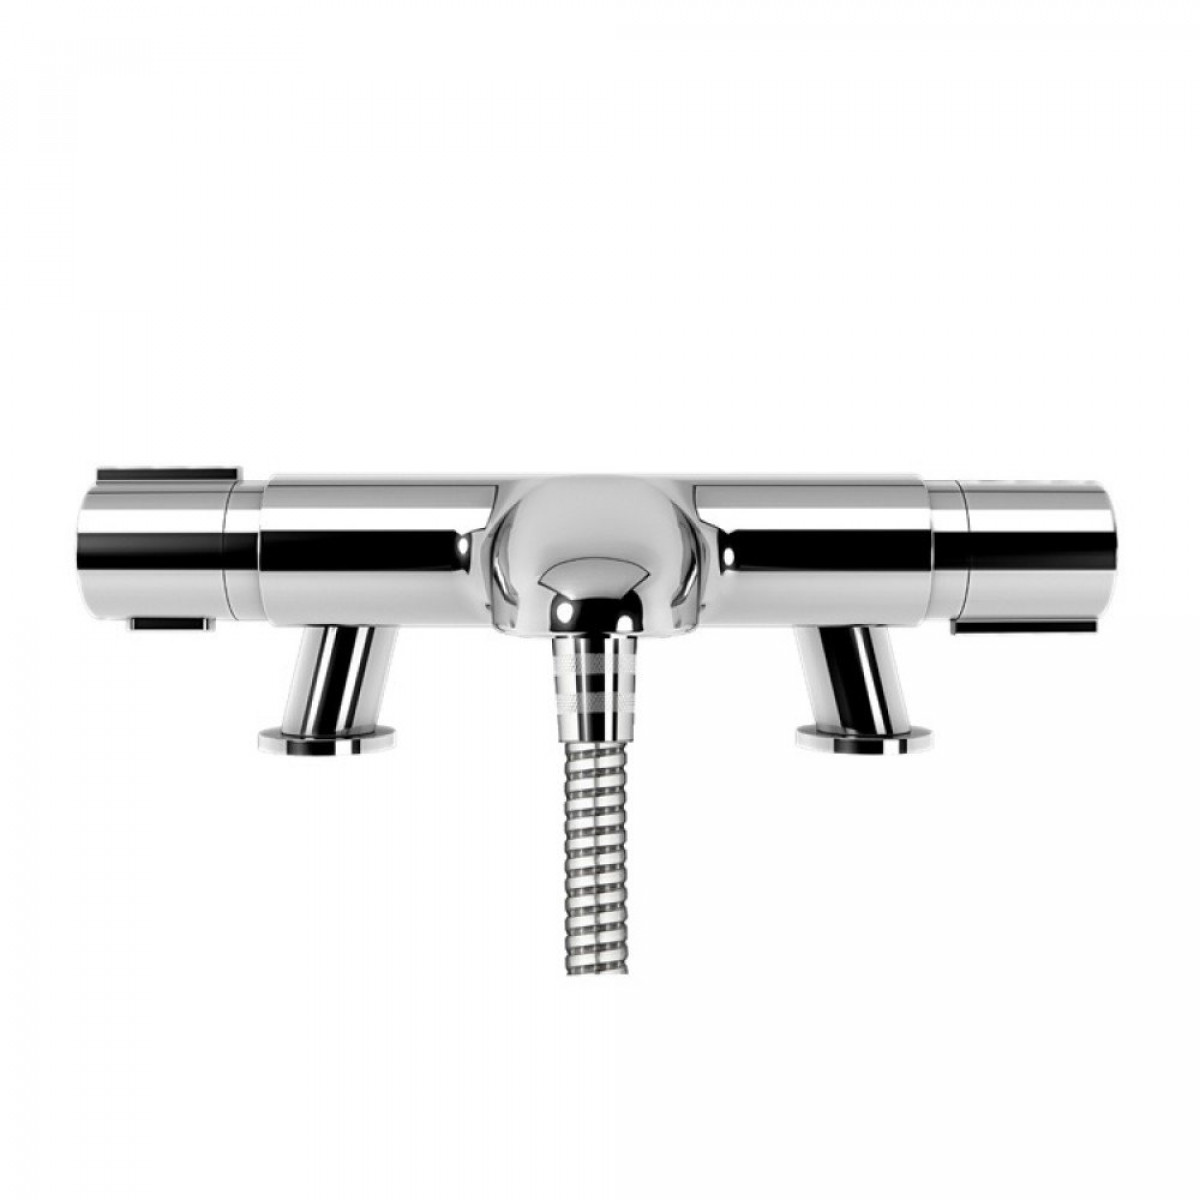 aqualisa midas 110 bath shower mixer md110bsm aqualisa midas 110 exposed bath shower mixer md110bsm